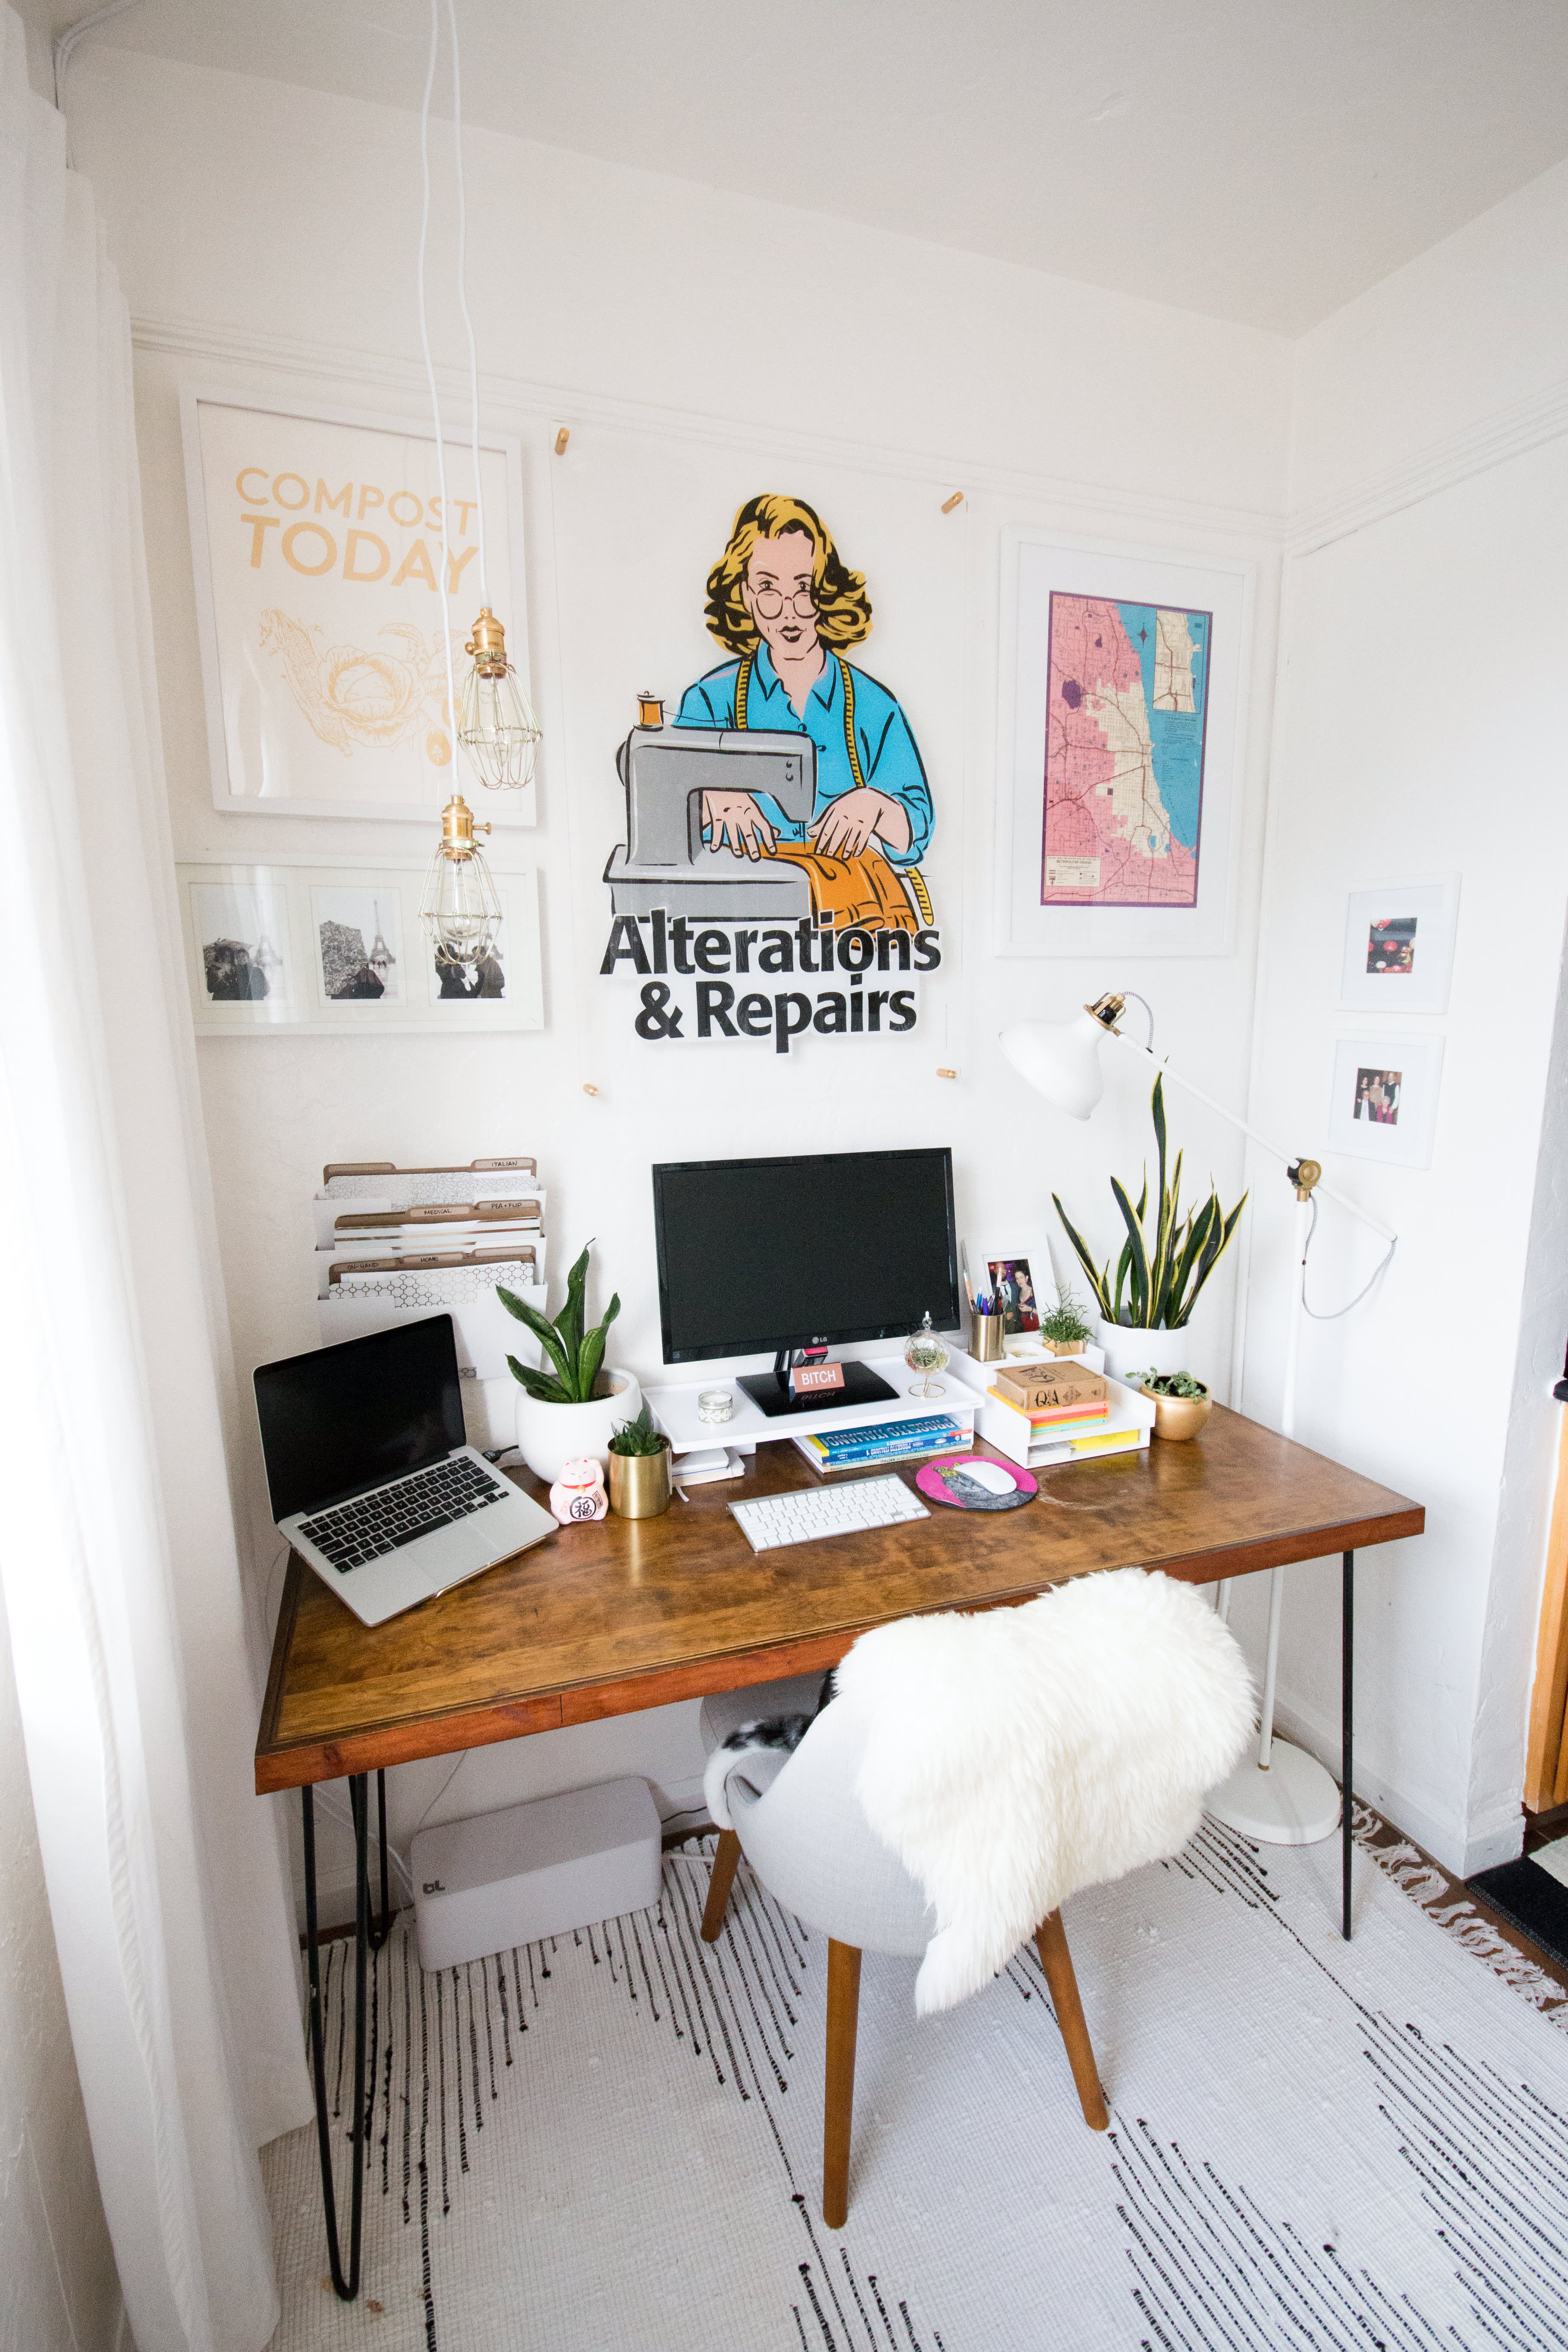 House Tour: A Colorful 400 Square Foot Studio Apartment ...